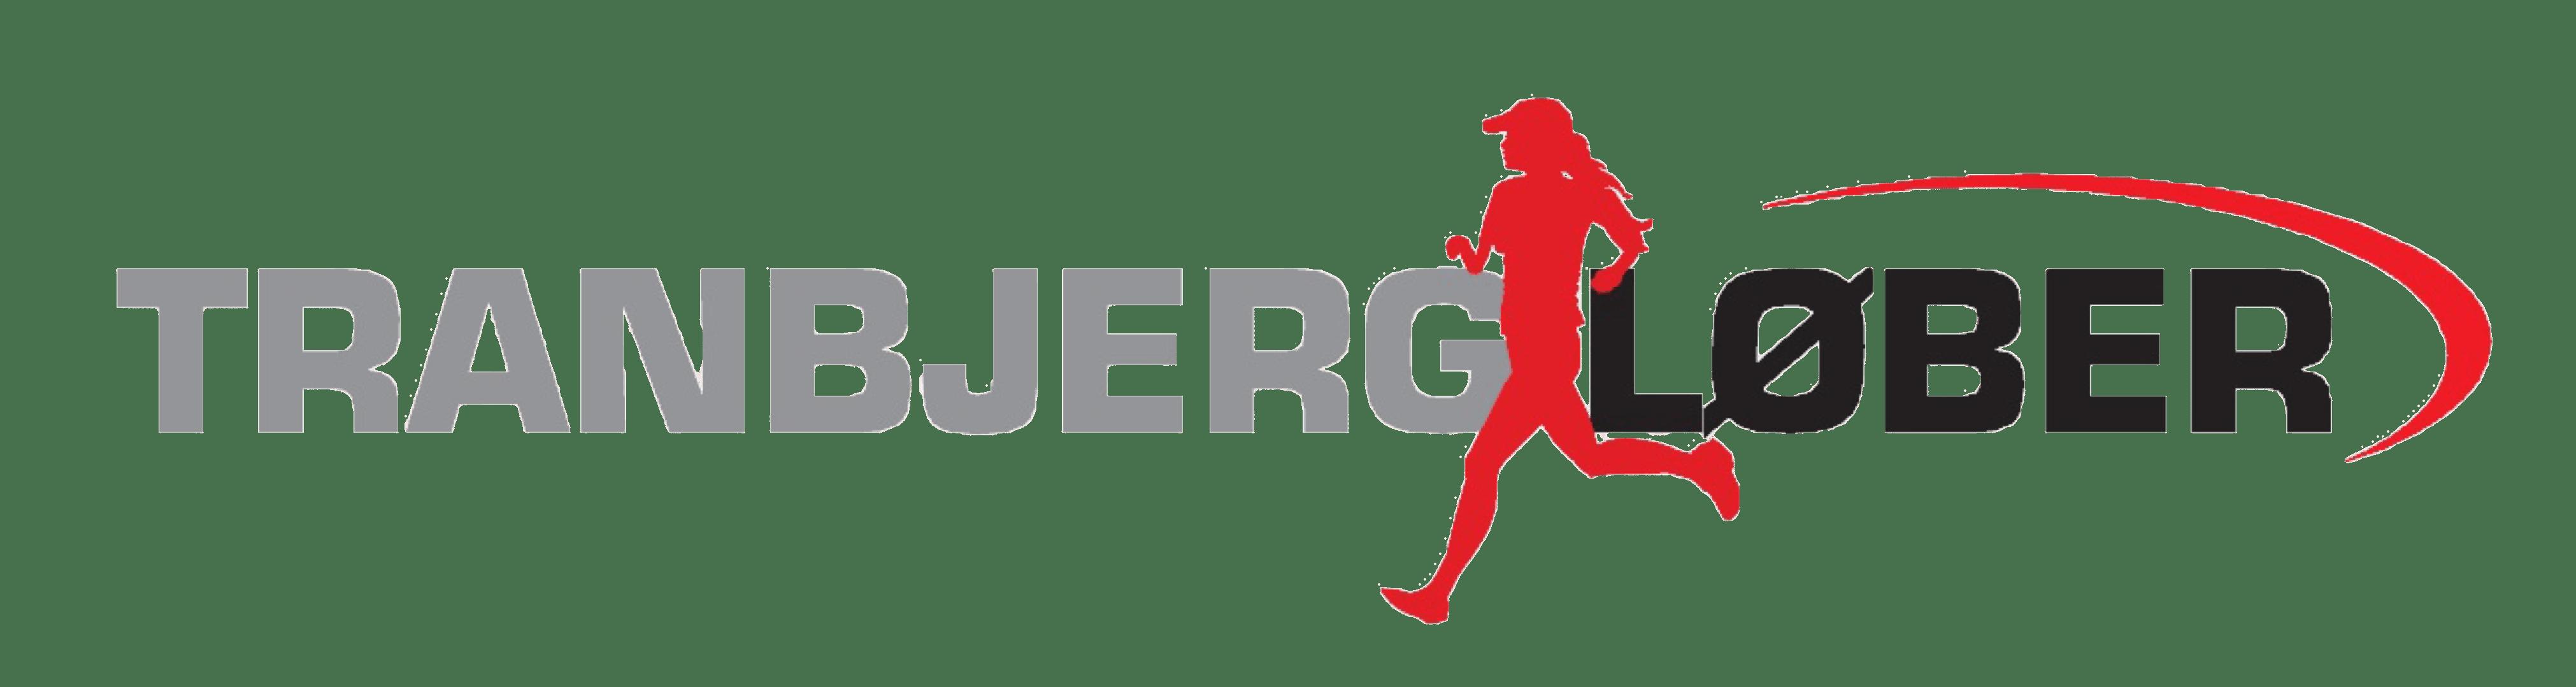 Tranbjerg Løber